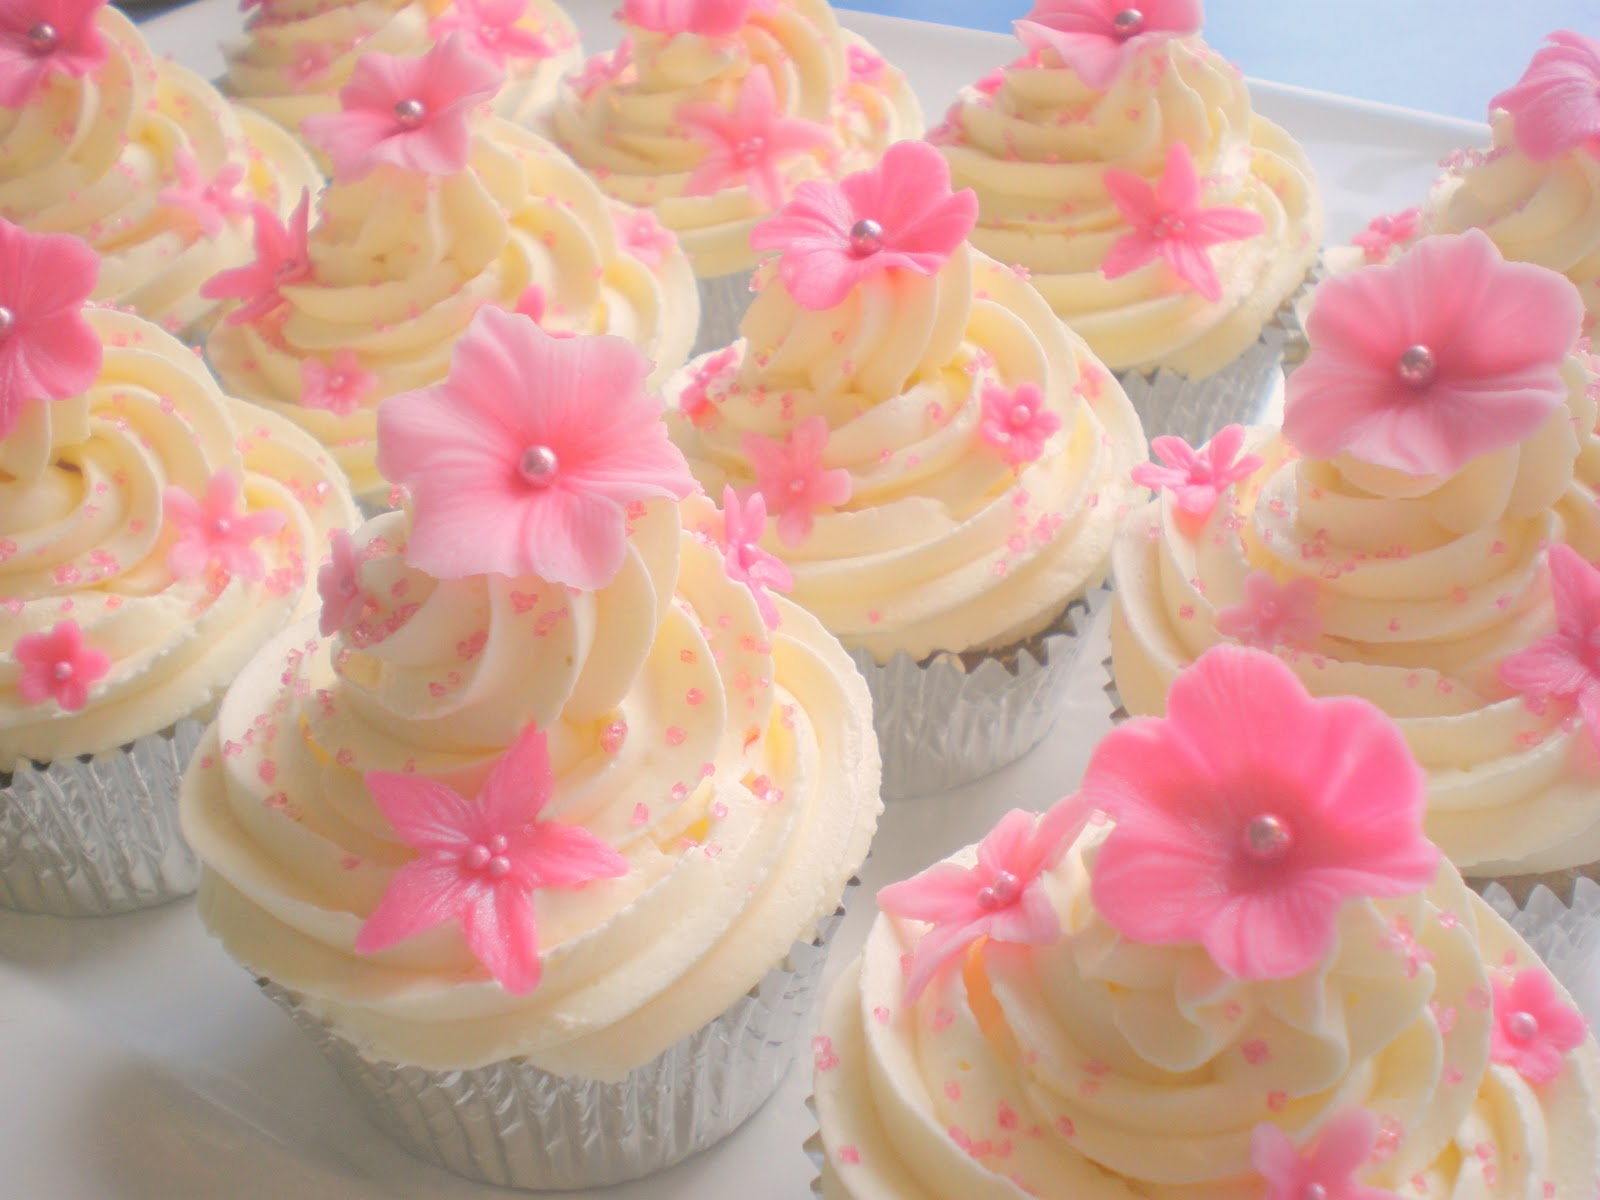 Cupcakes+-+Vanilla+with+Pink+Flowers+03.jpg